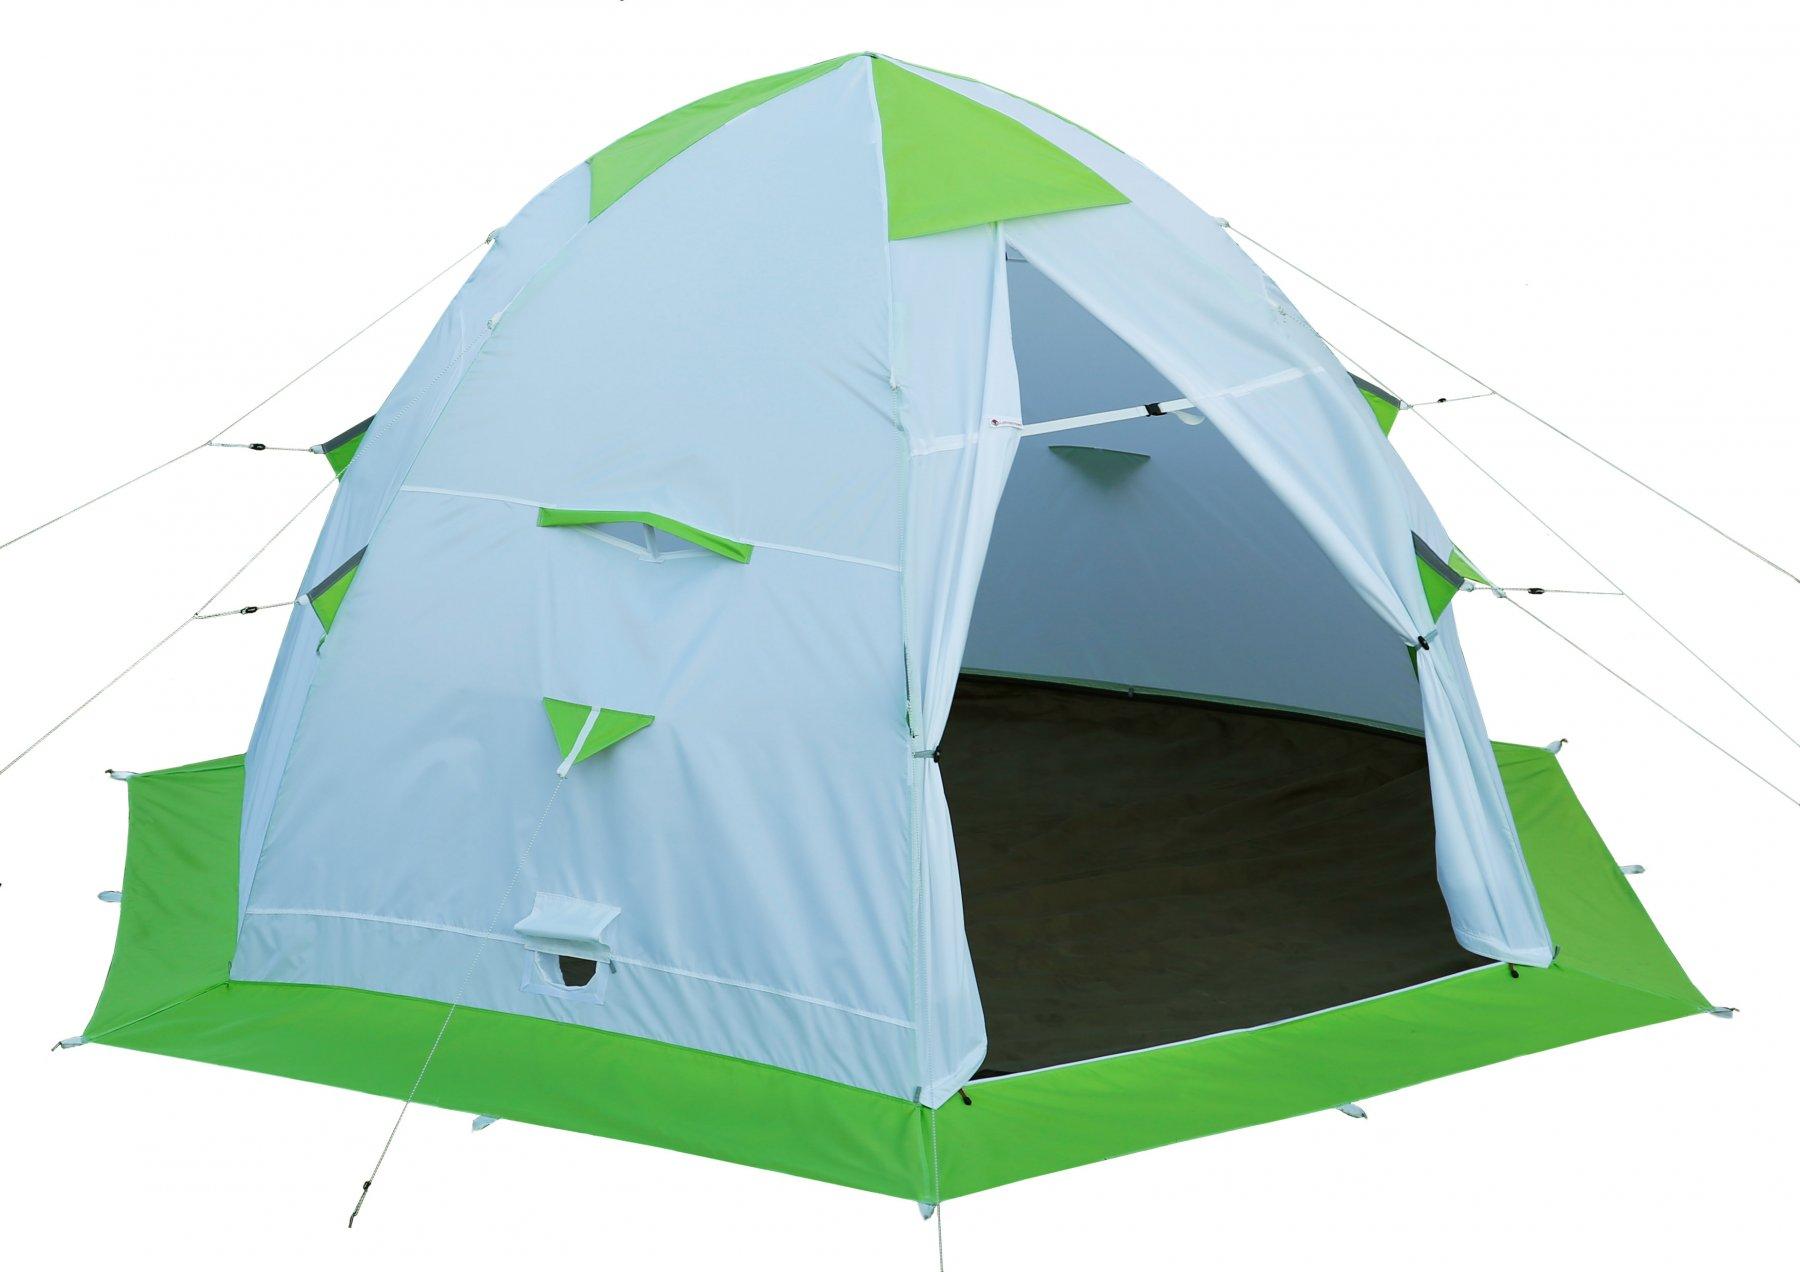 Зимняя палатка Лотос 5С с каркасом Л5-С12 (стеклокомпозитная арматура 12 мм)